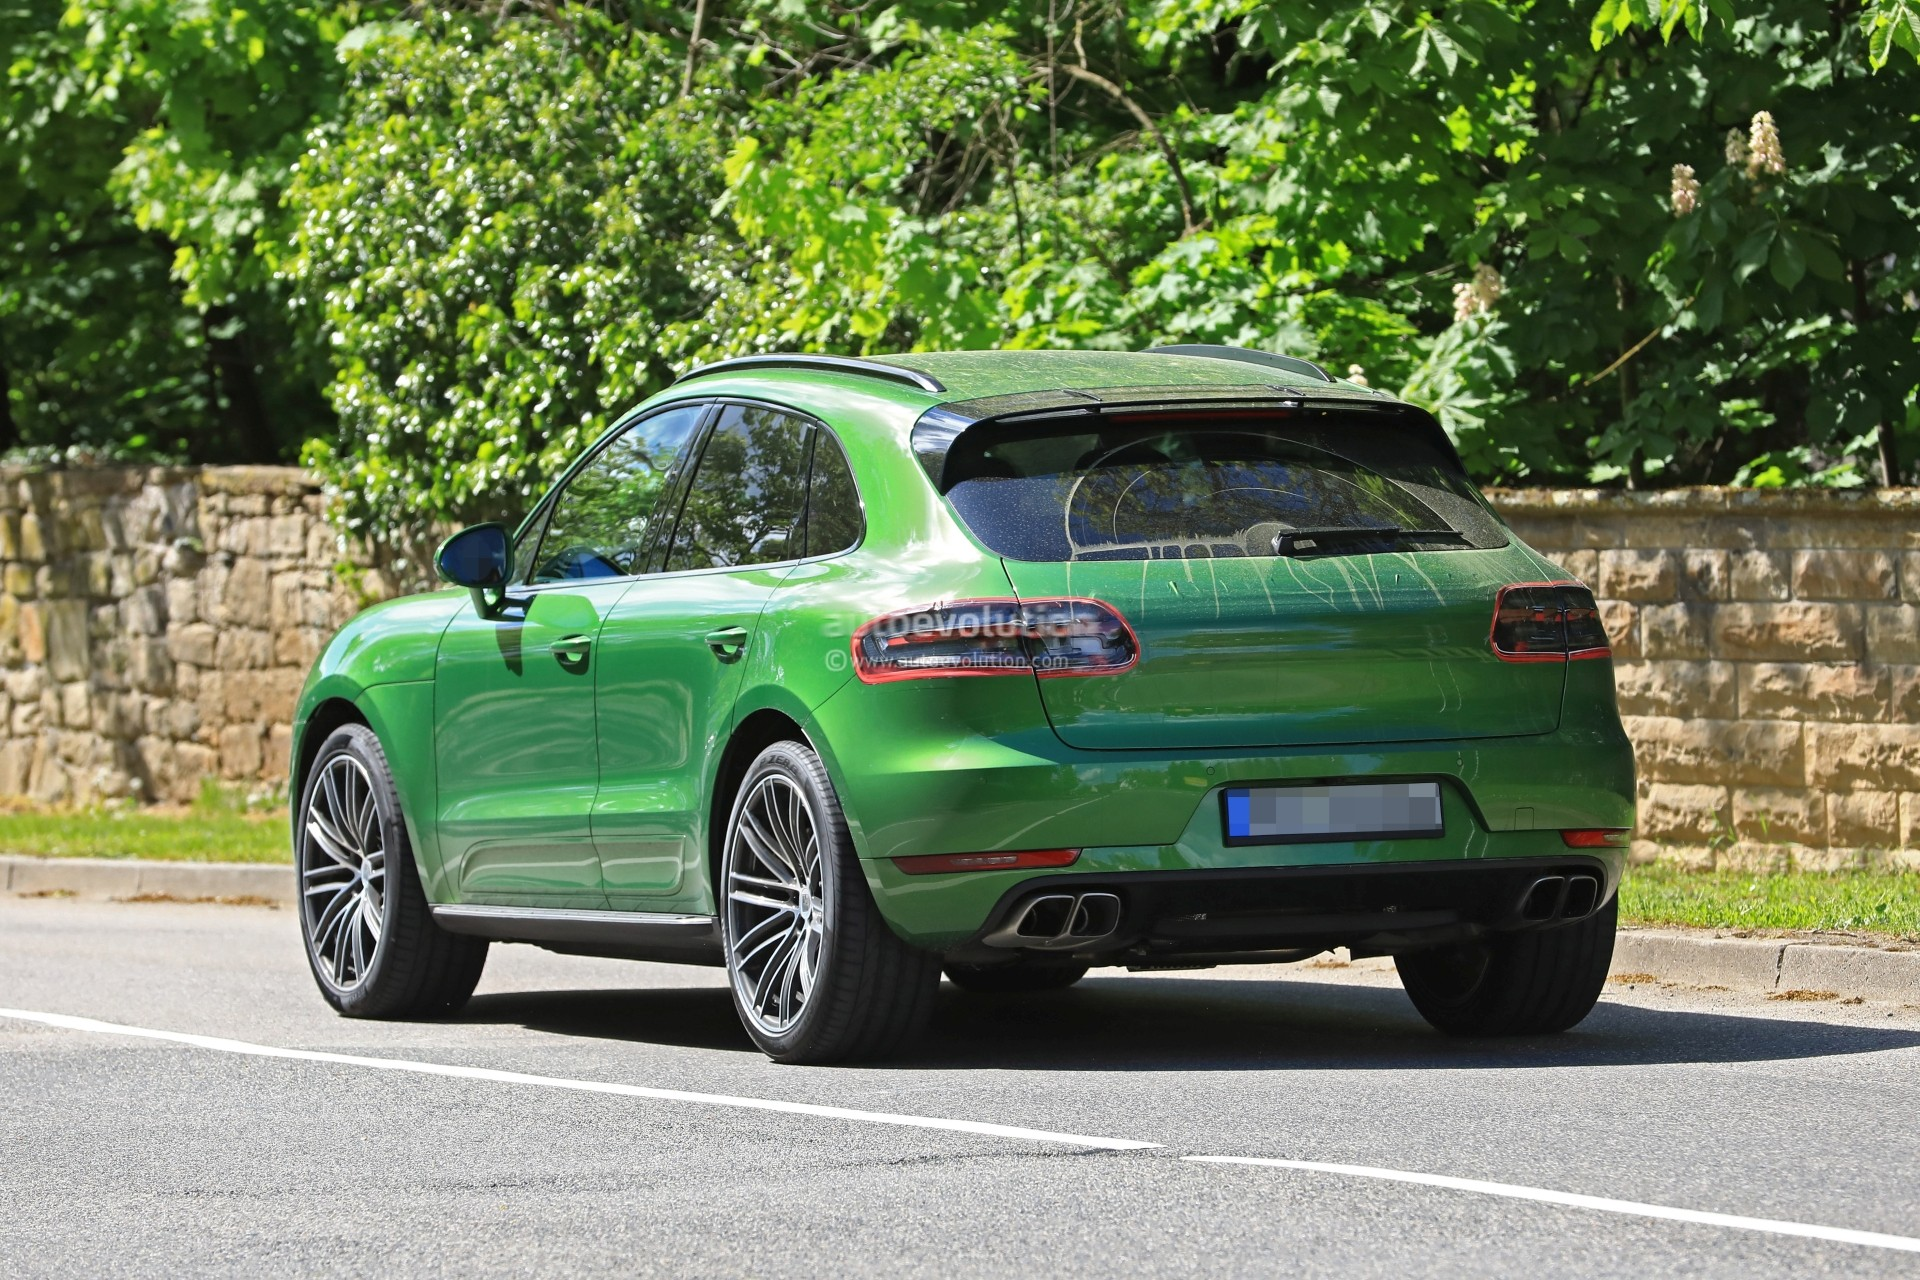 2019 Porsche Macan Facelift Ditches Diesel, Gasoline ...